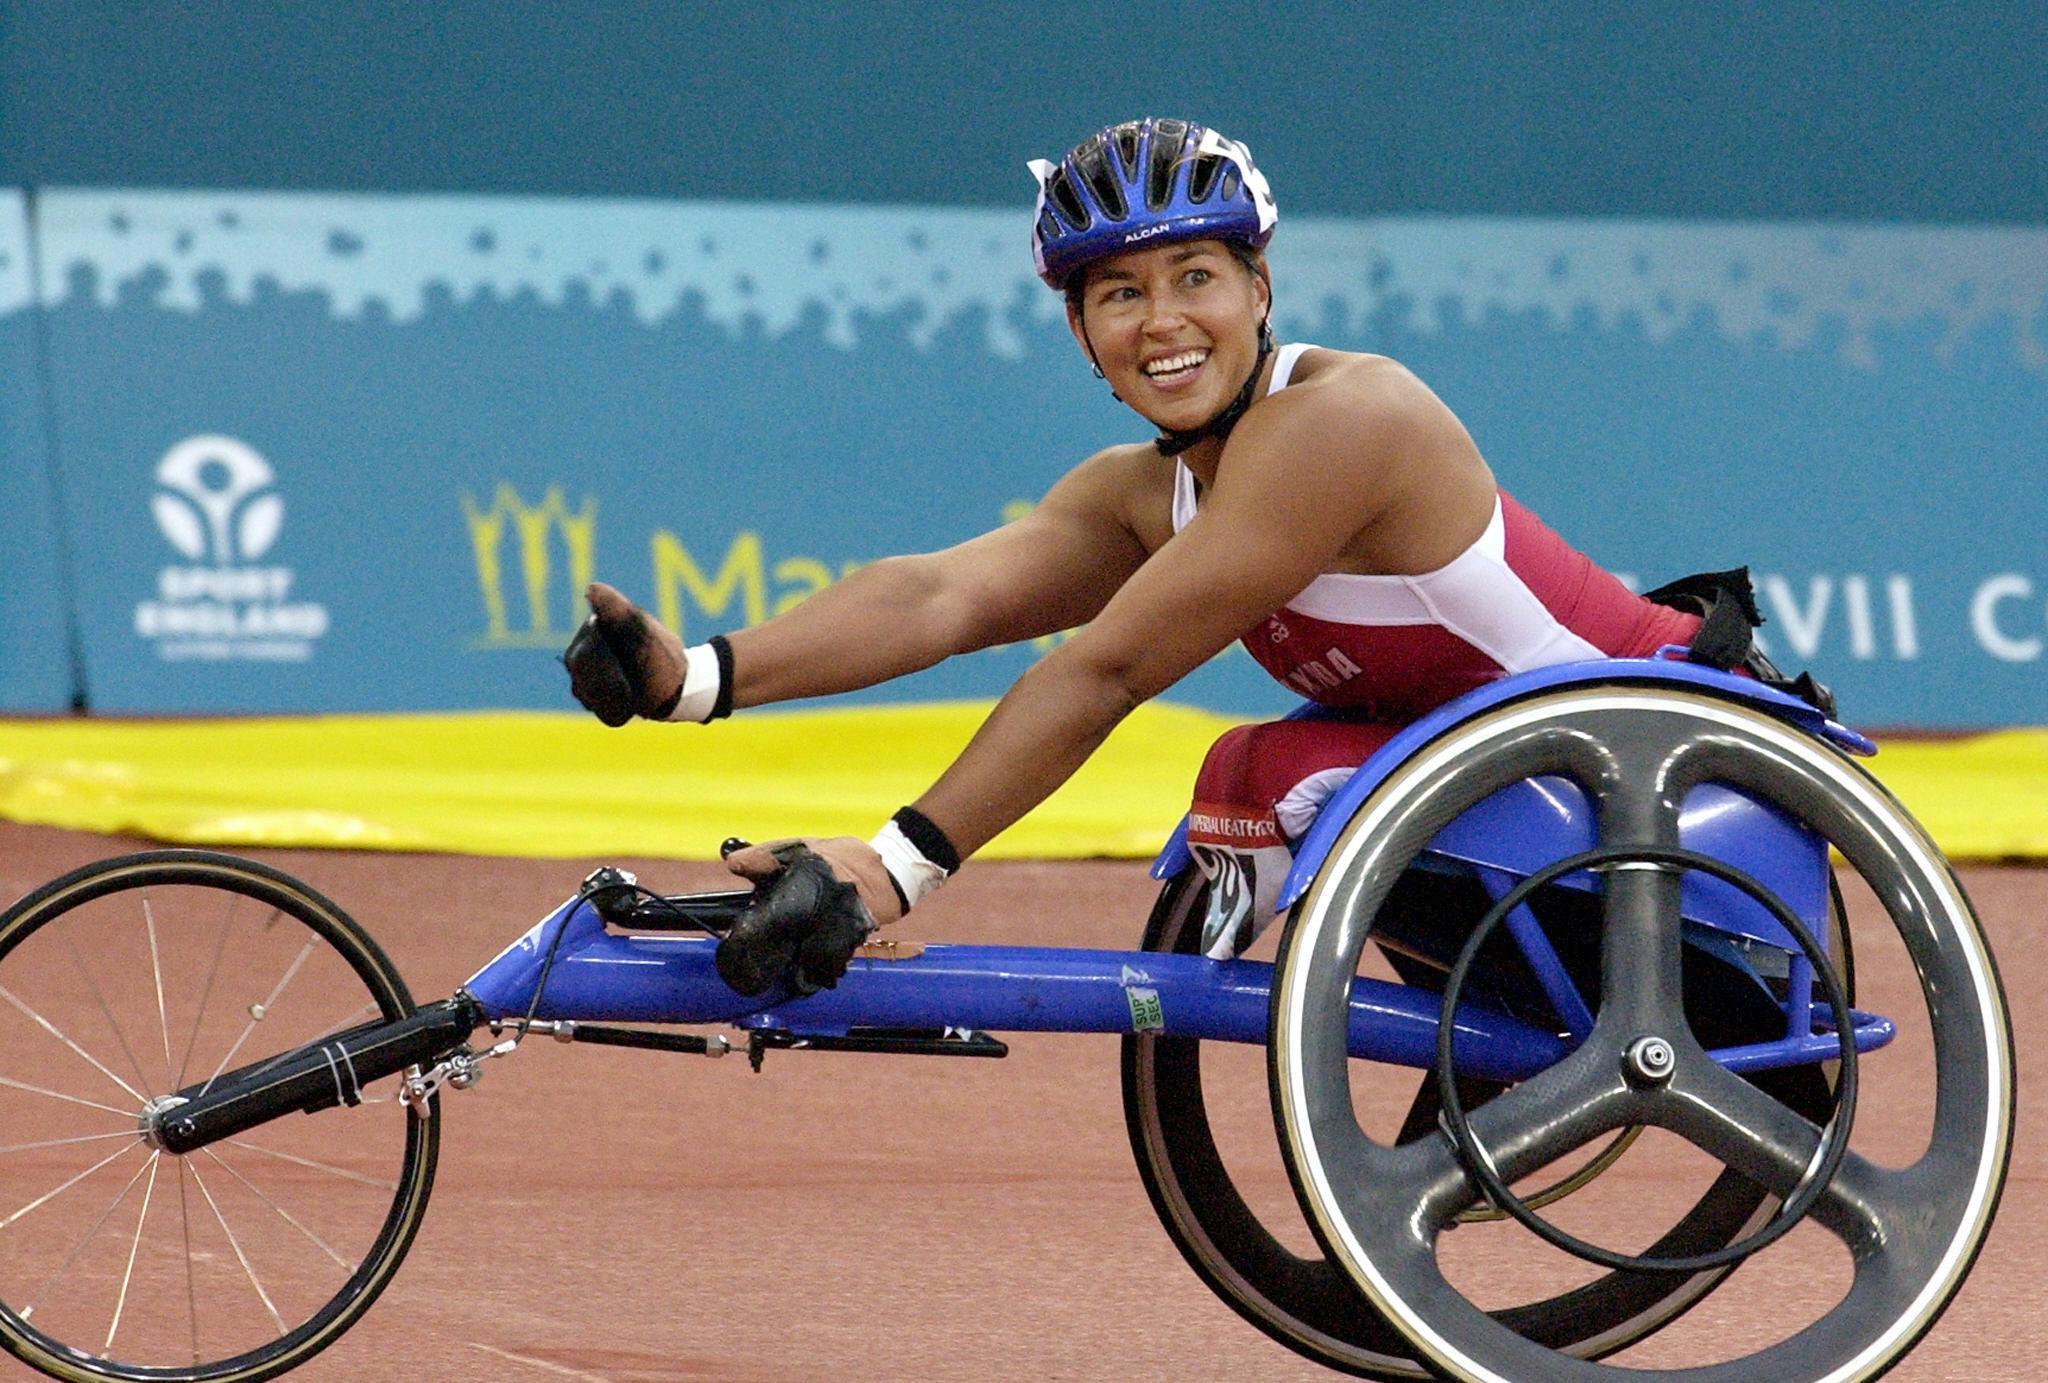 8. Trailblazer Chantal Petitclerc wins first Commonwealth Games gold medal in Para-sport